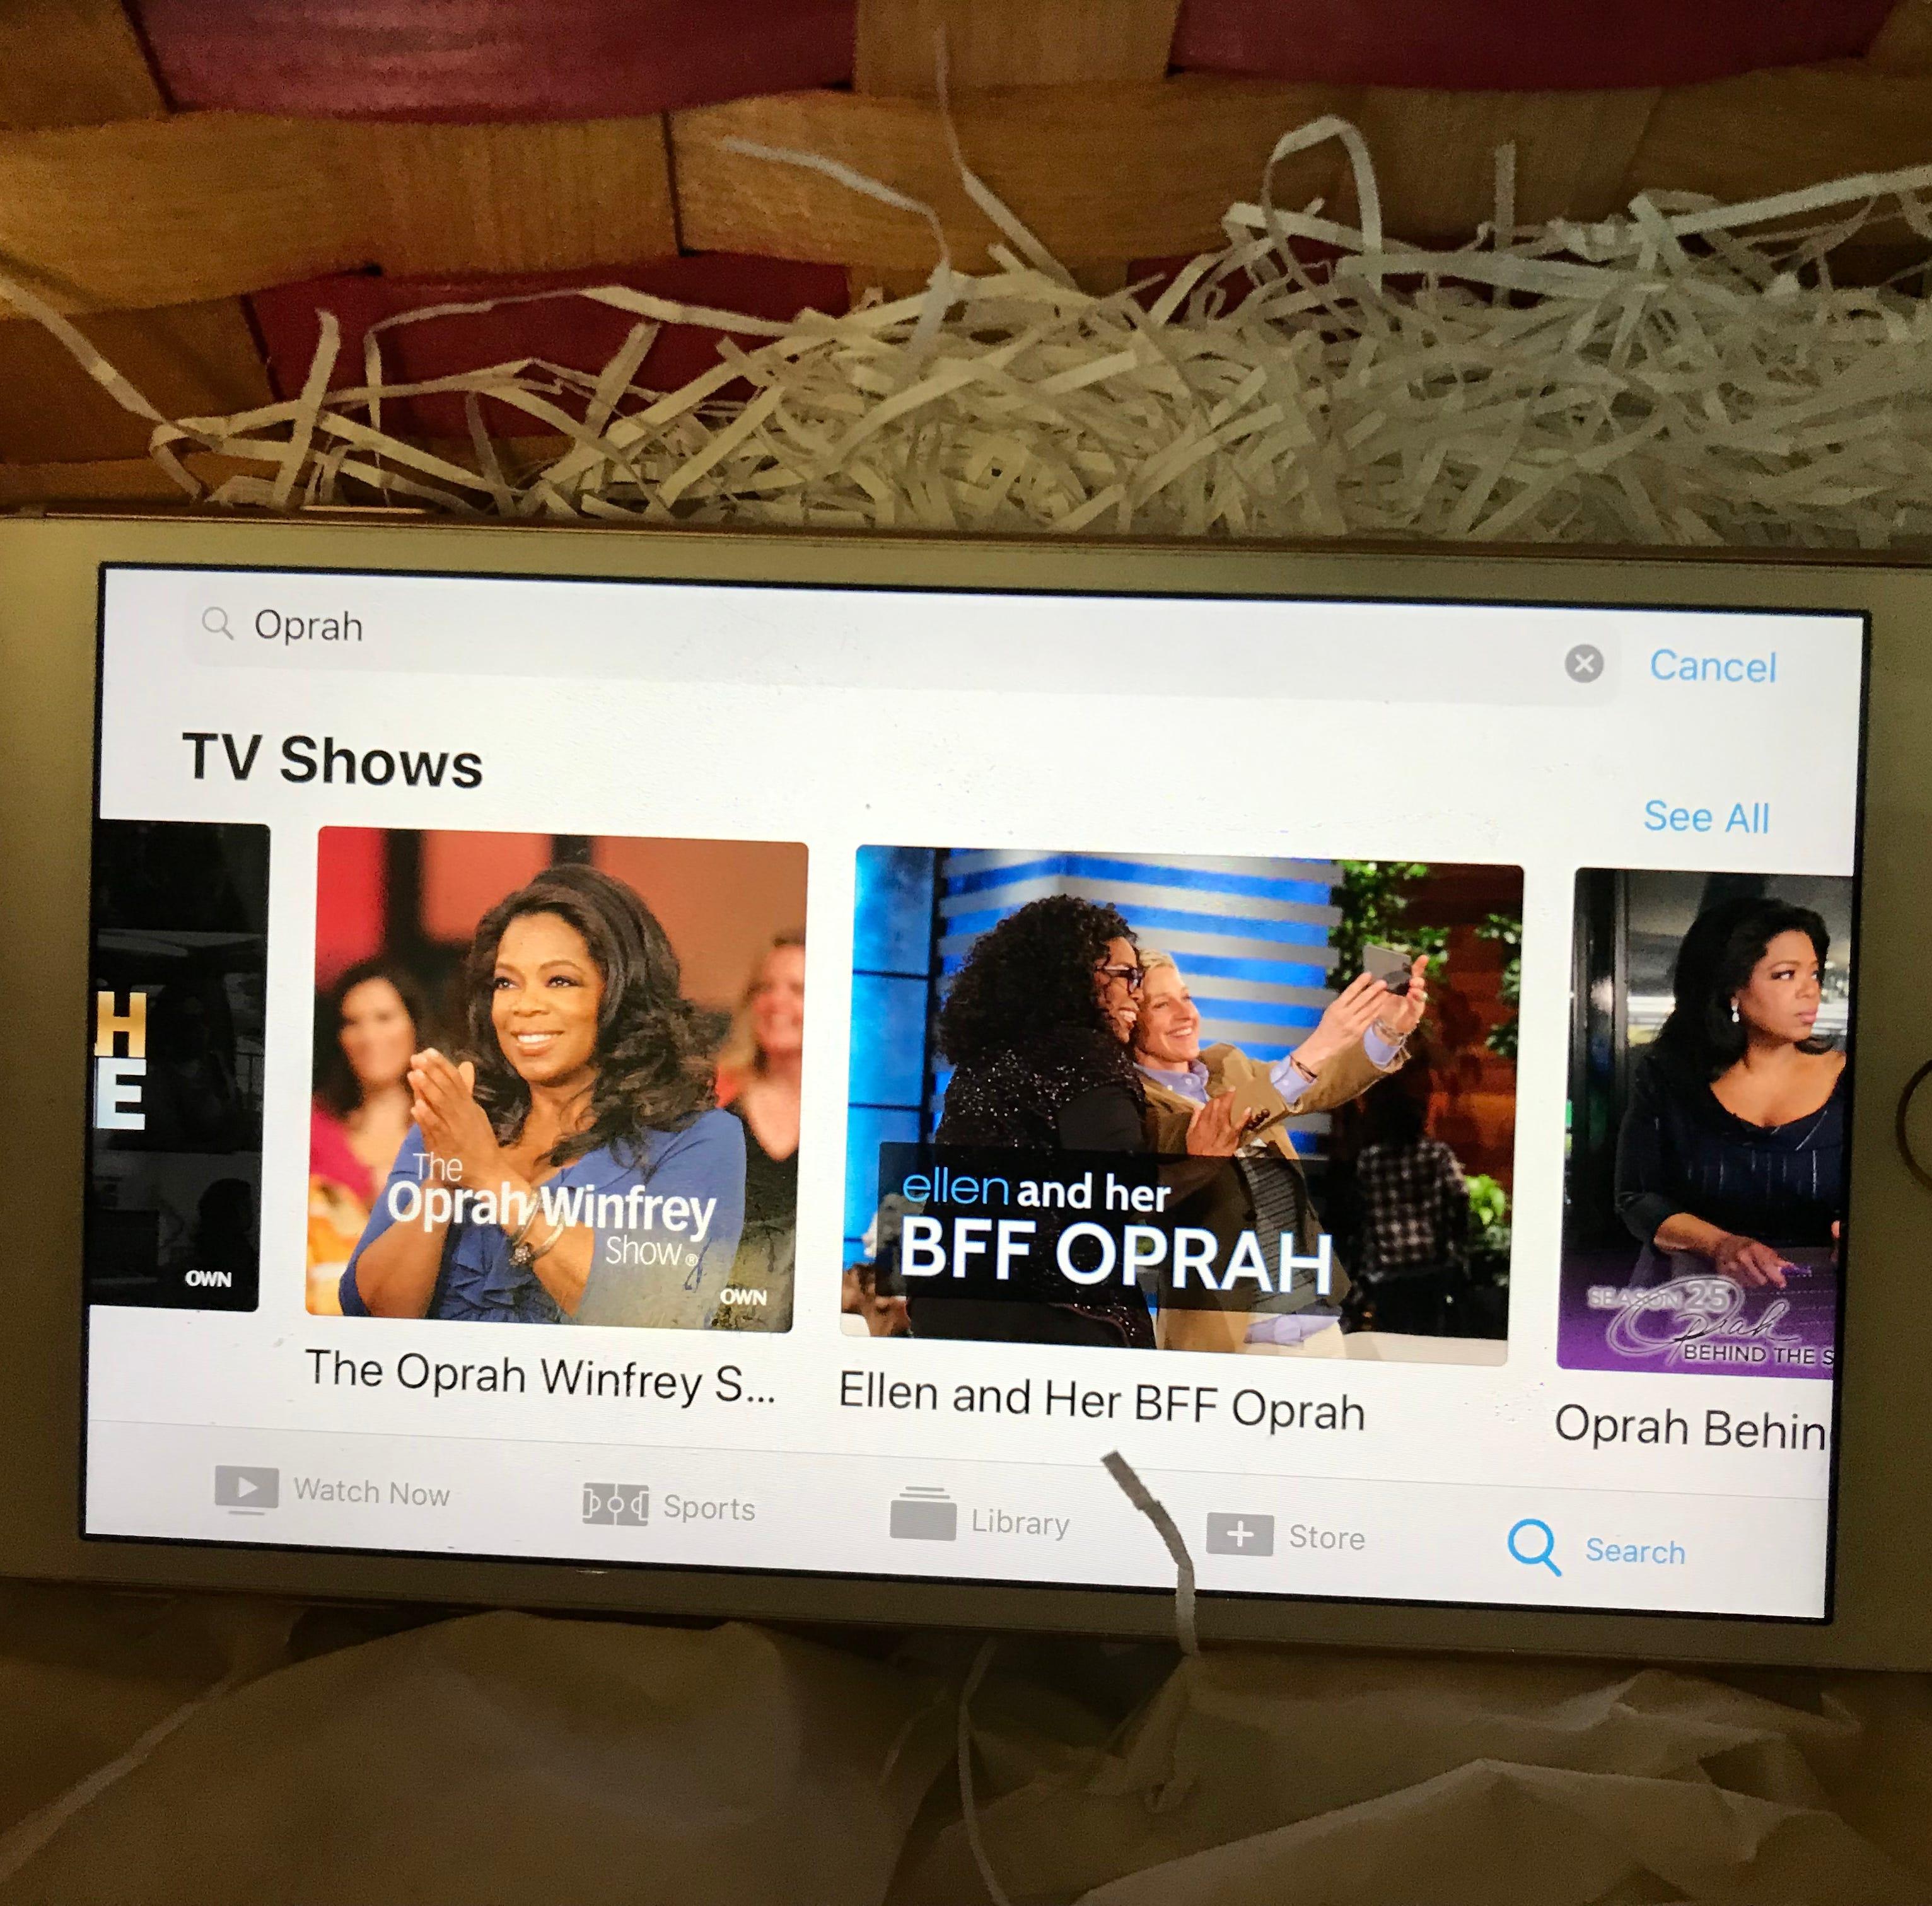 Oprah Winfrey TV shows on iPhone